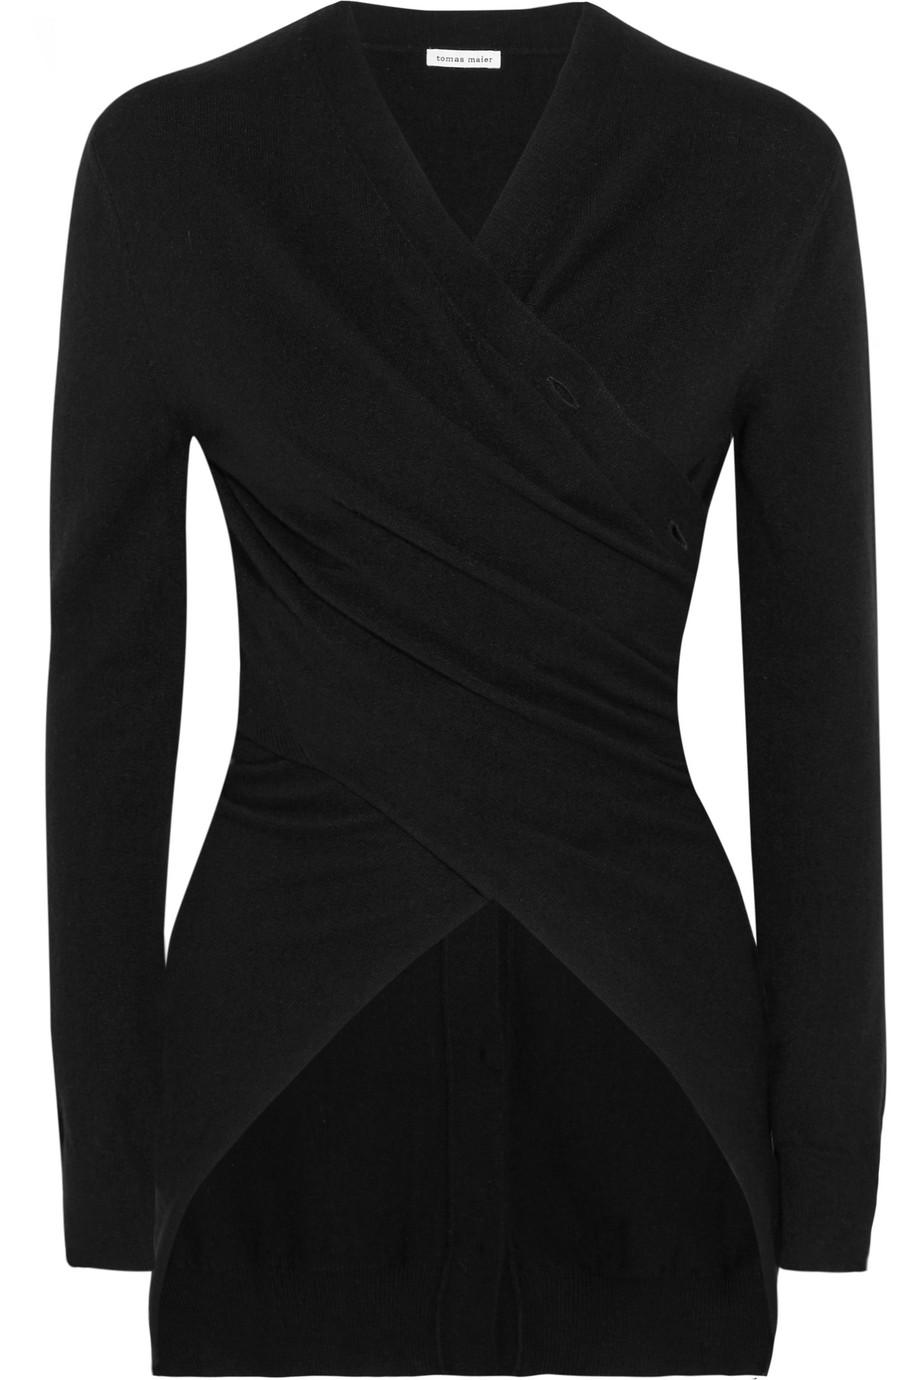 Tomas Maier Asymmetric Cashmere Wrap Cardigan, Black, Women's, Size: 0